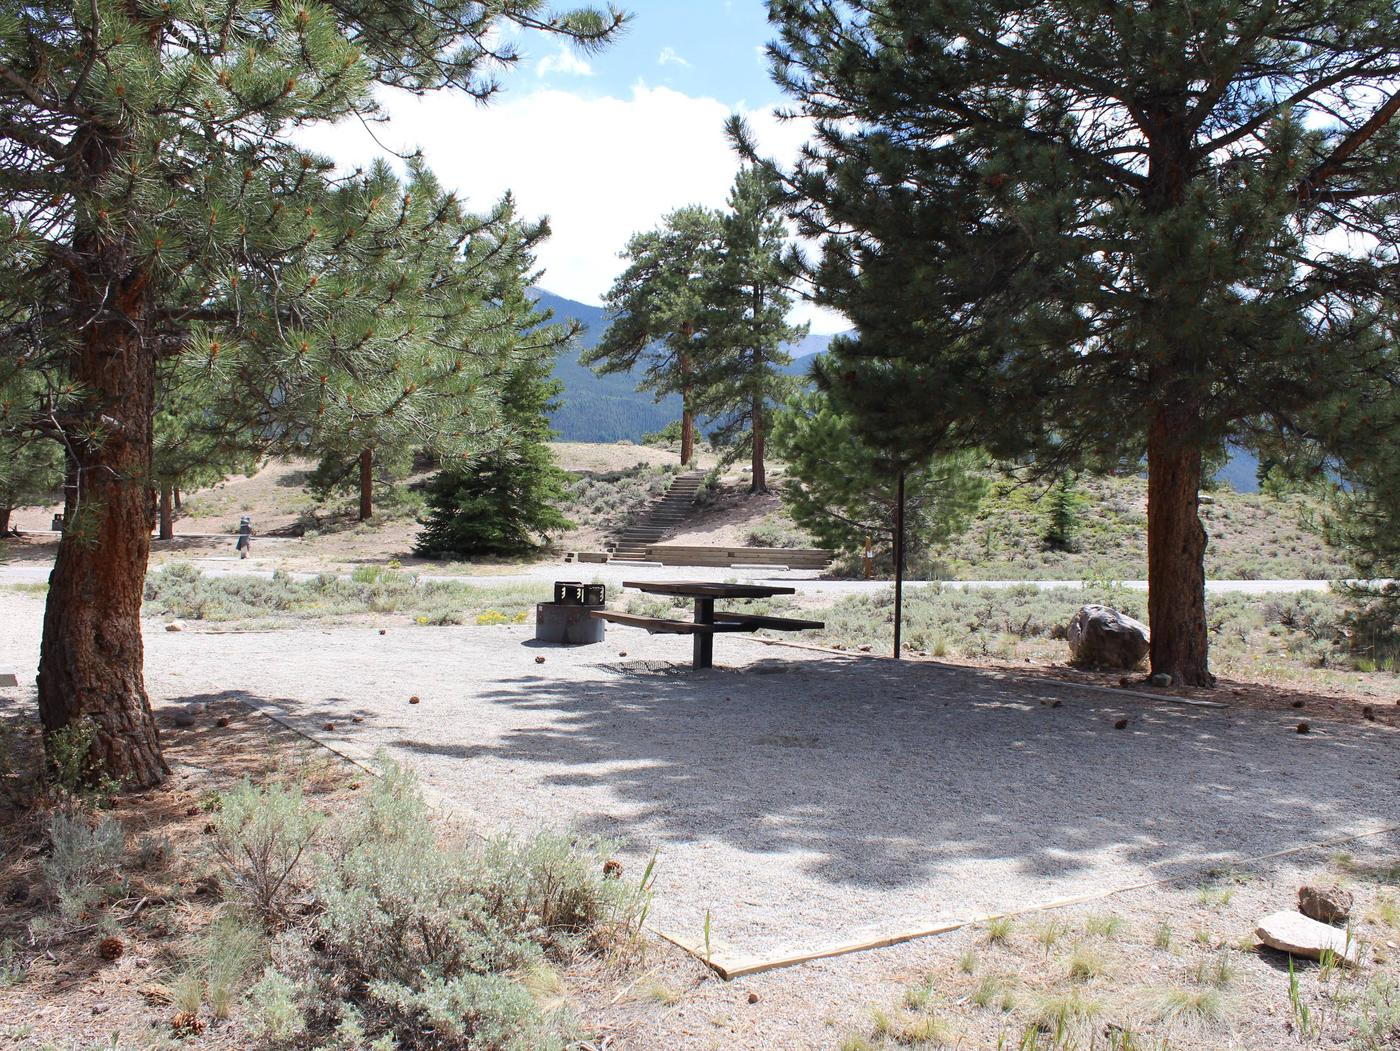 White Star Campground, site 13